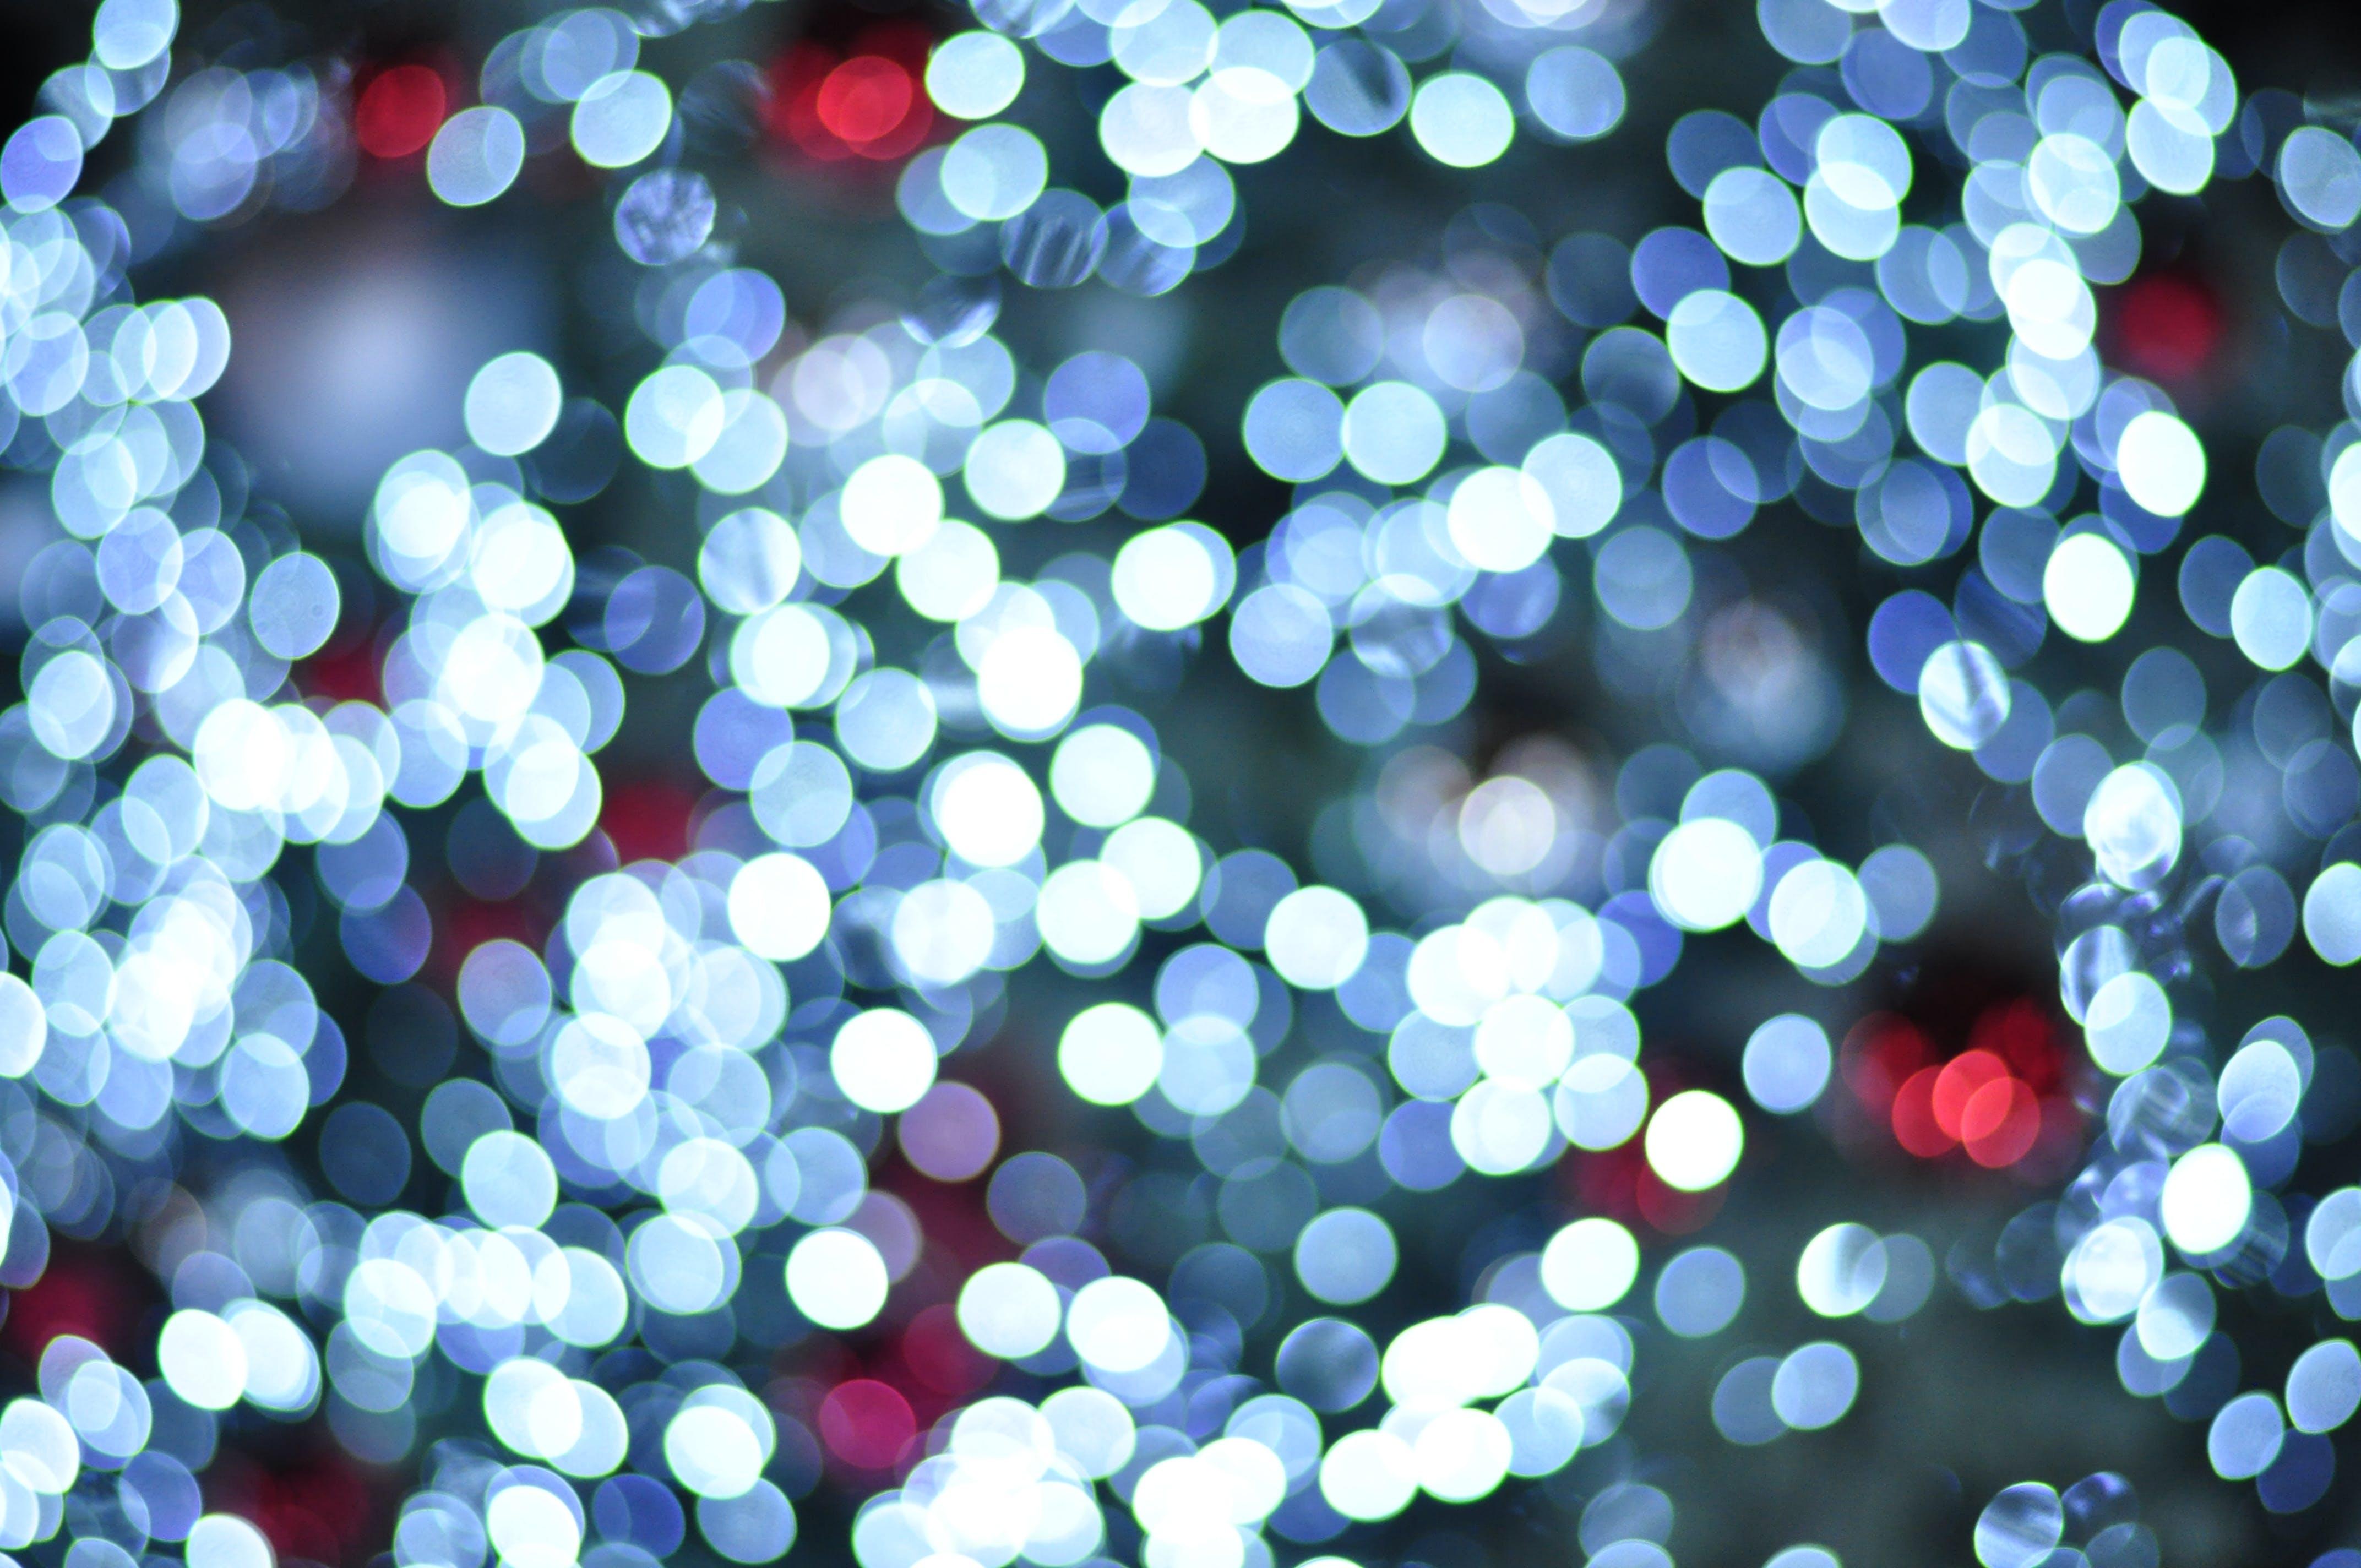 Free stock photo of blue, blur, blurred, blurred background